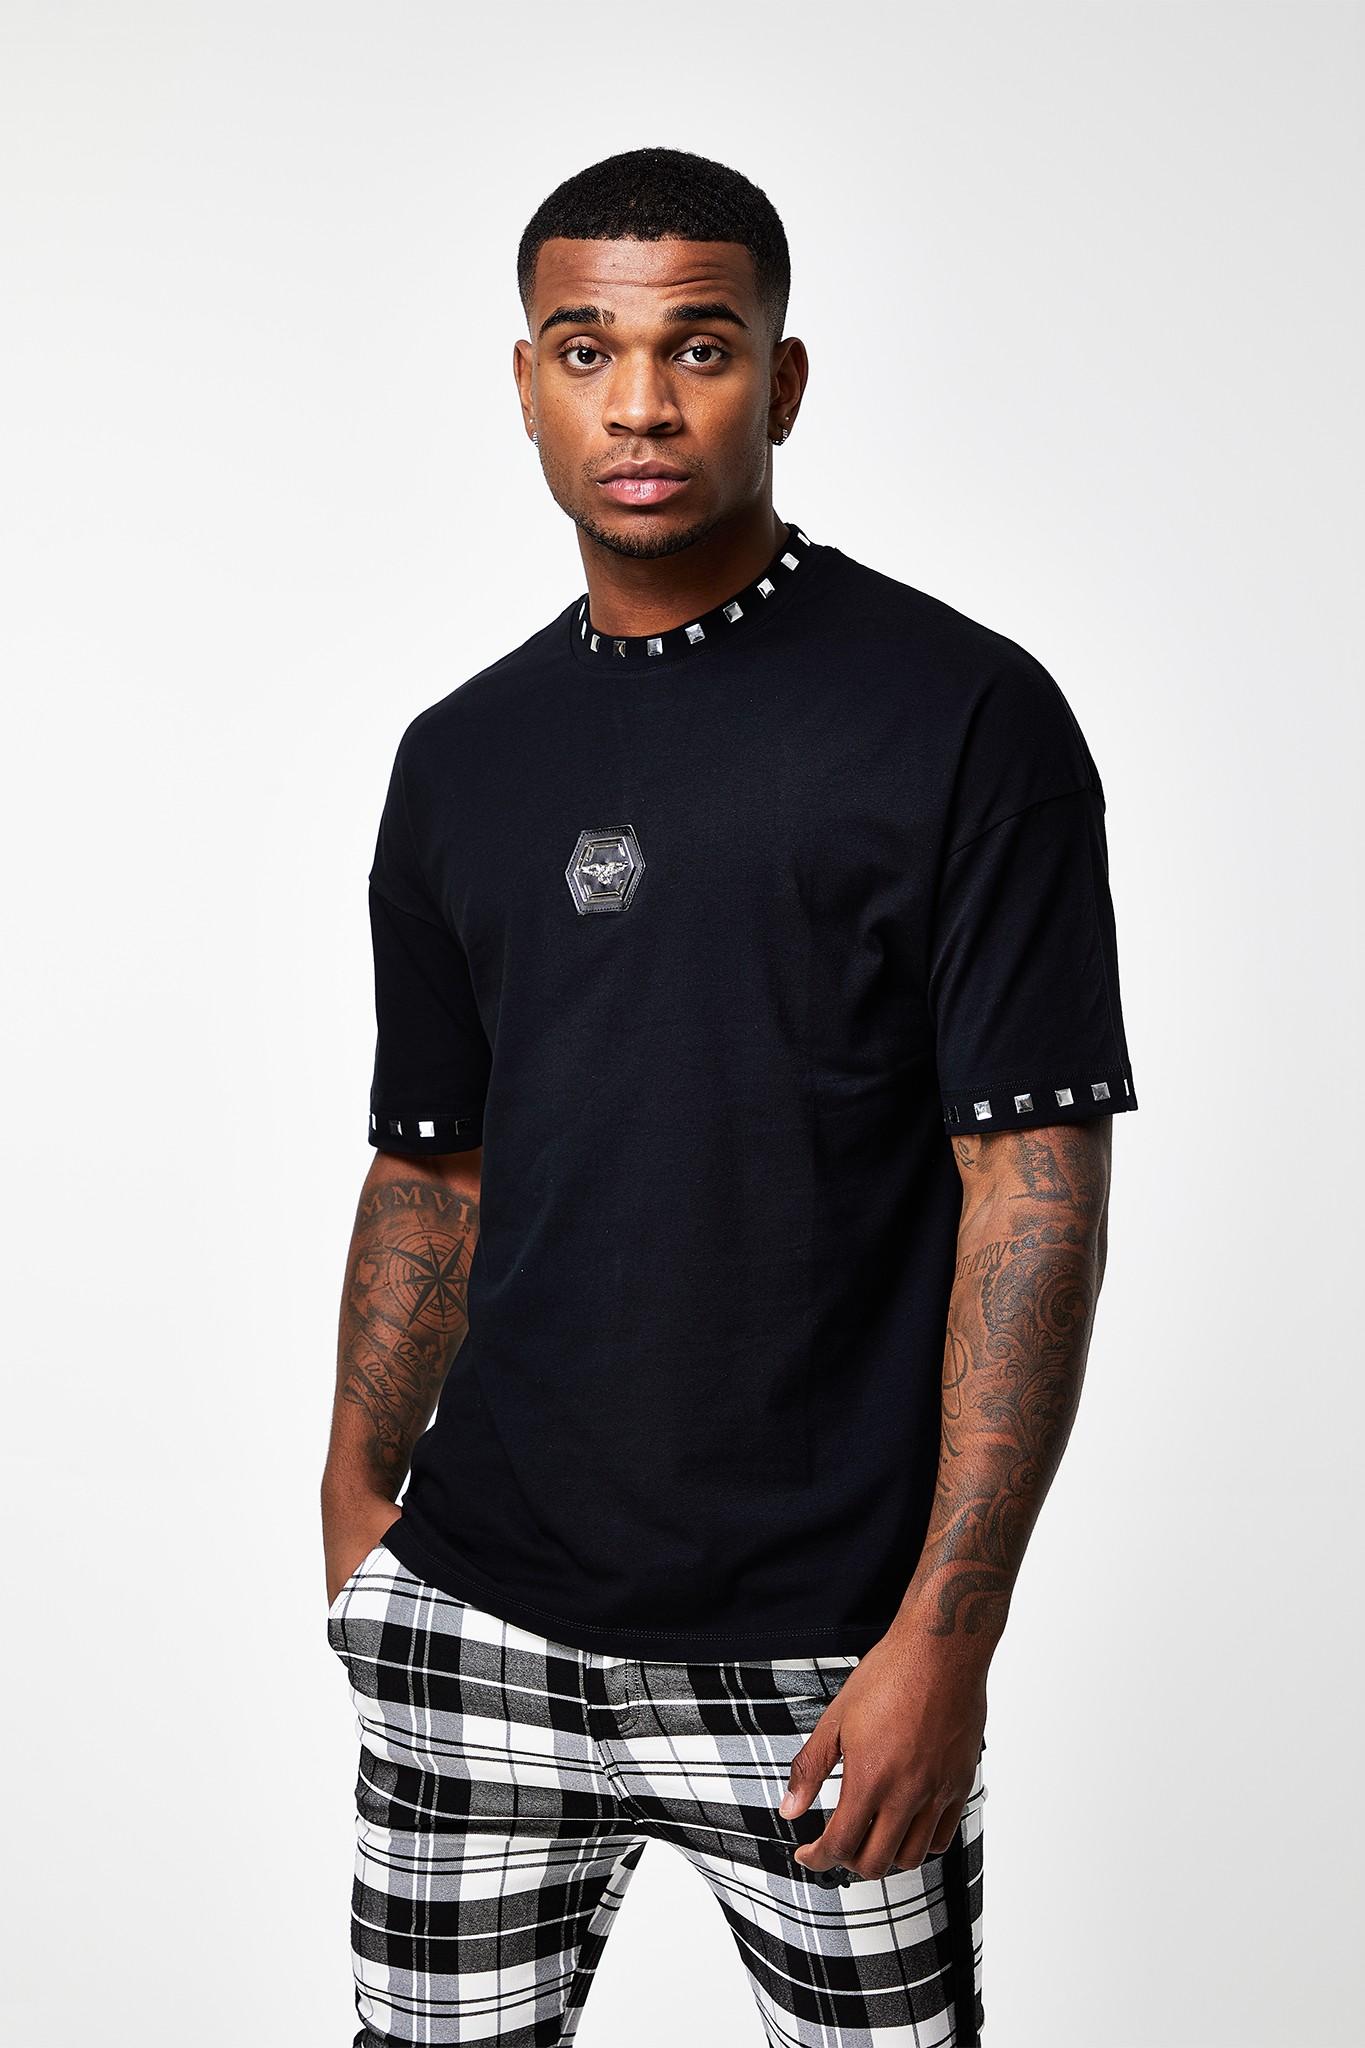 Camiseta Oversize Bling Bling Limited Edition